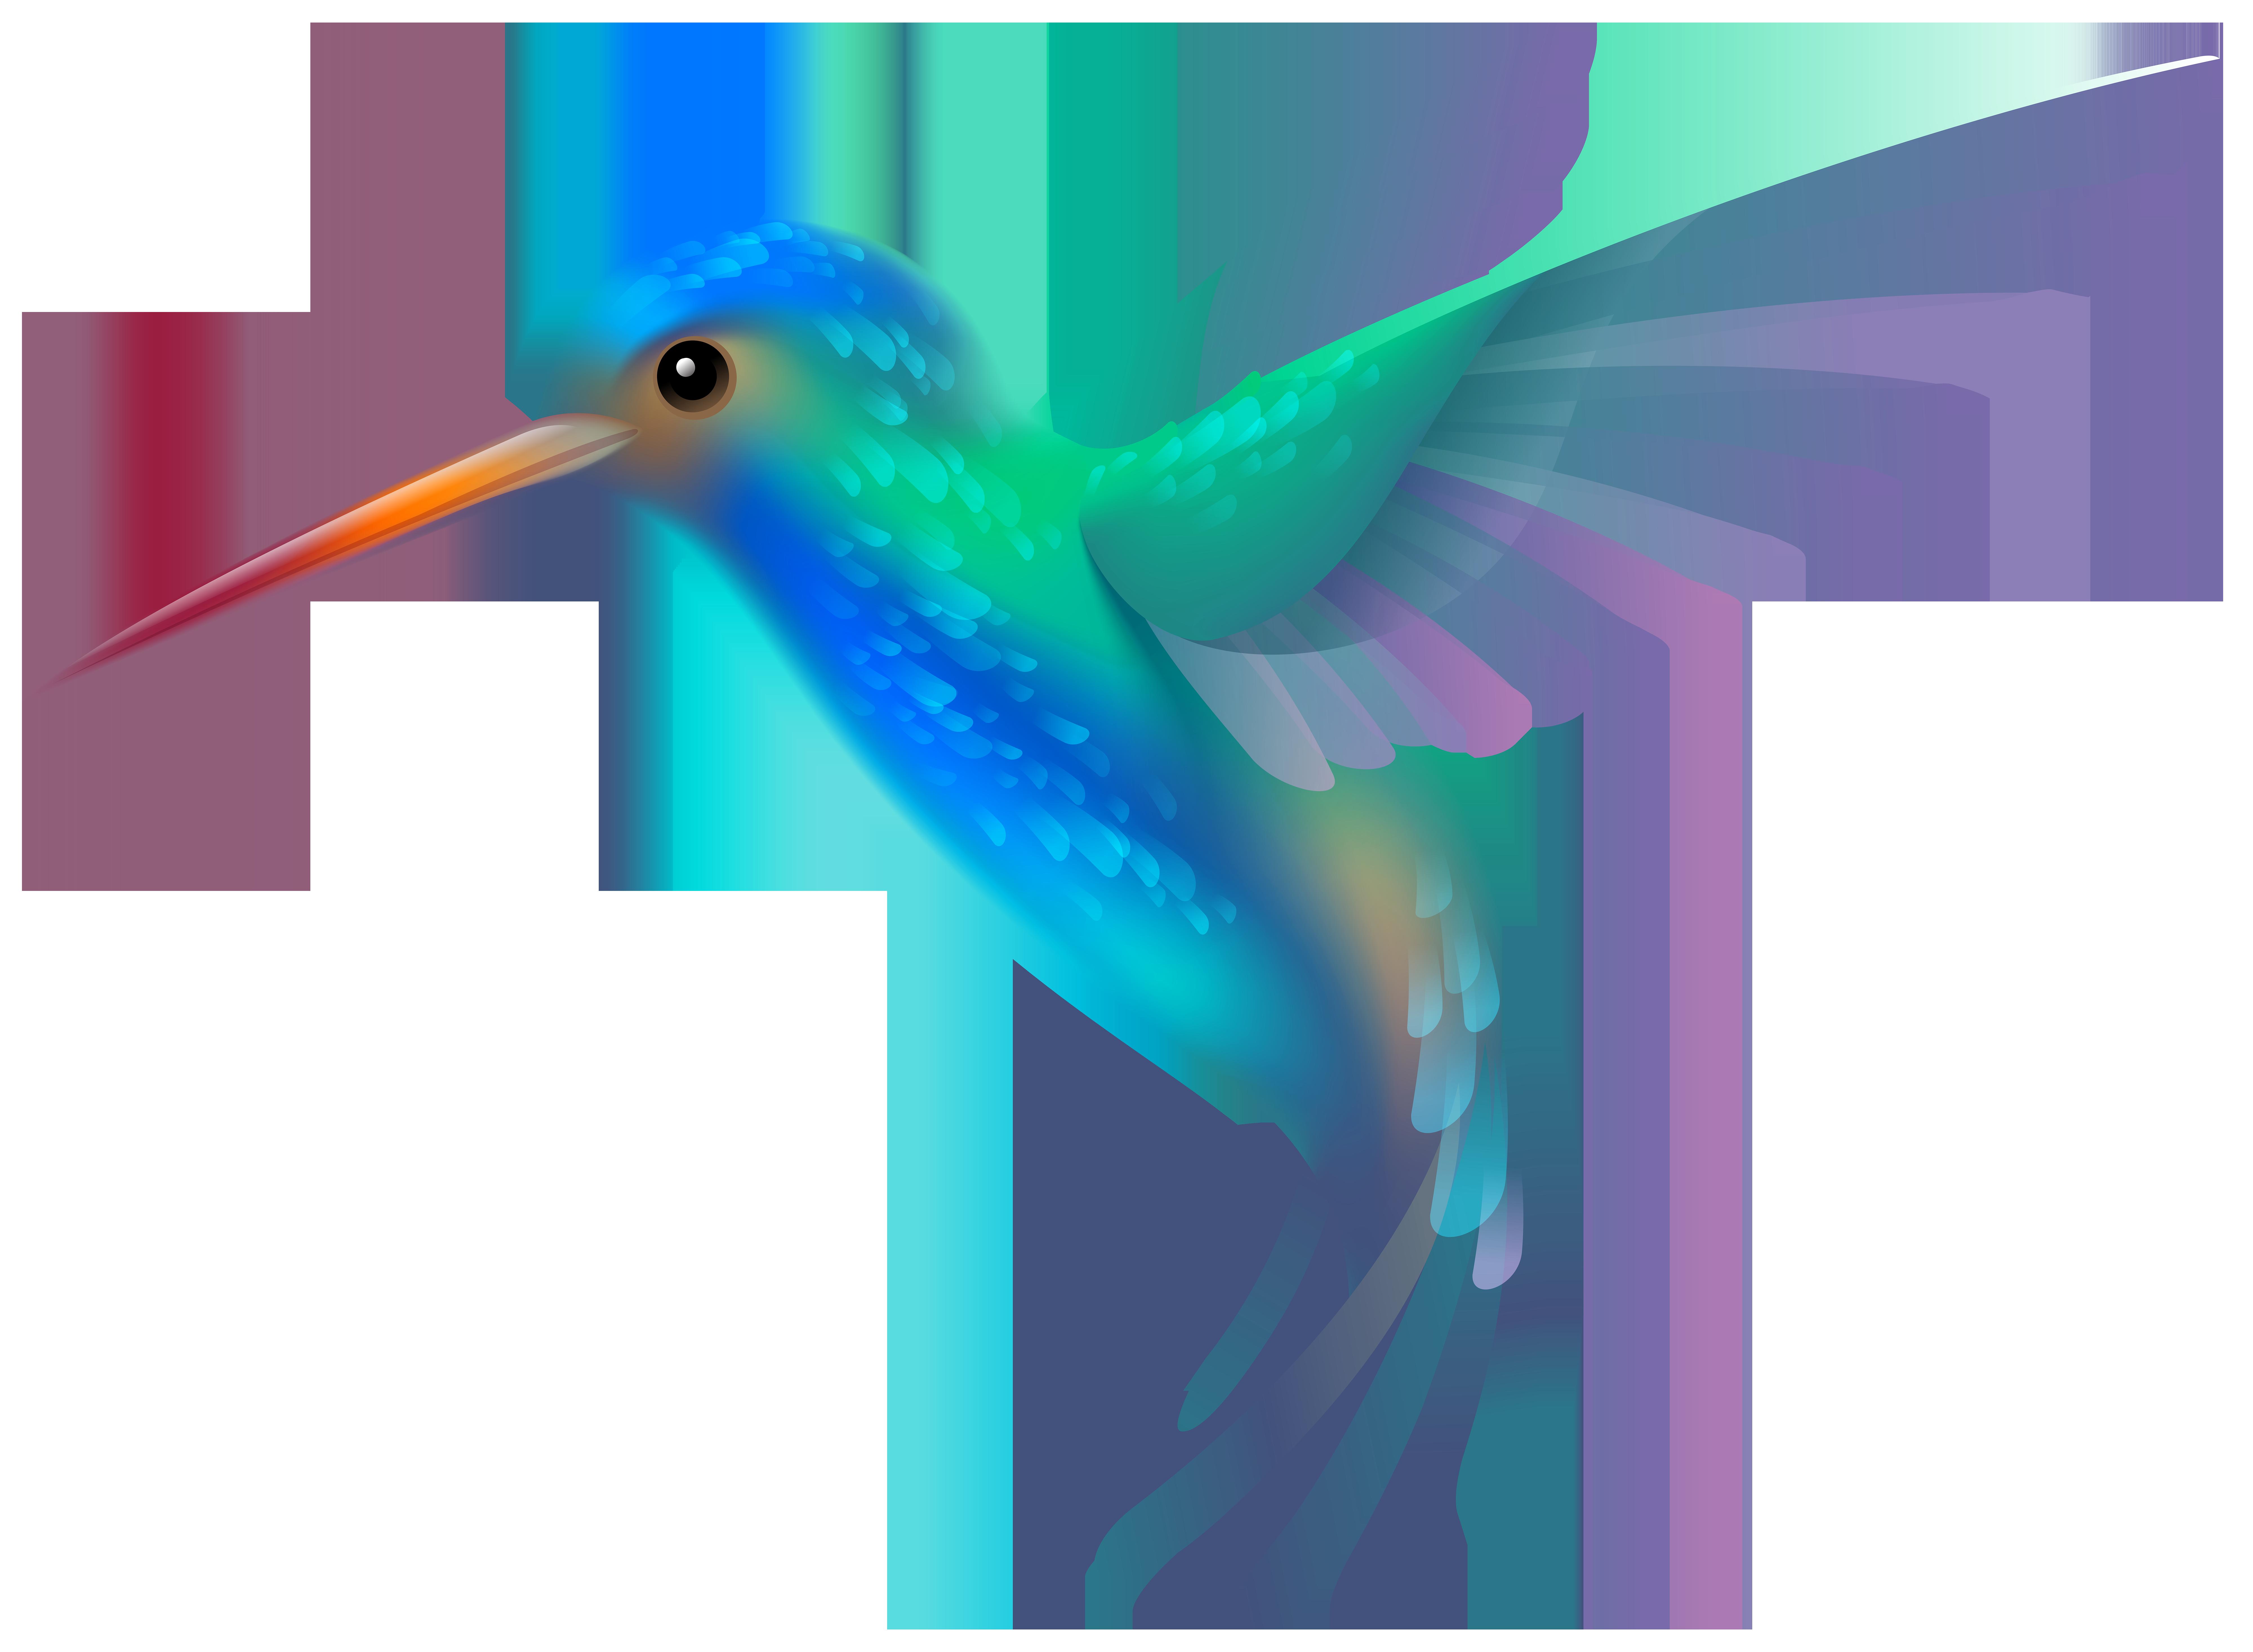 Clipart hummingbird clip art library library Humming Bird Clipart | Free download best Humming Bird Clipart on ... clip art library library